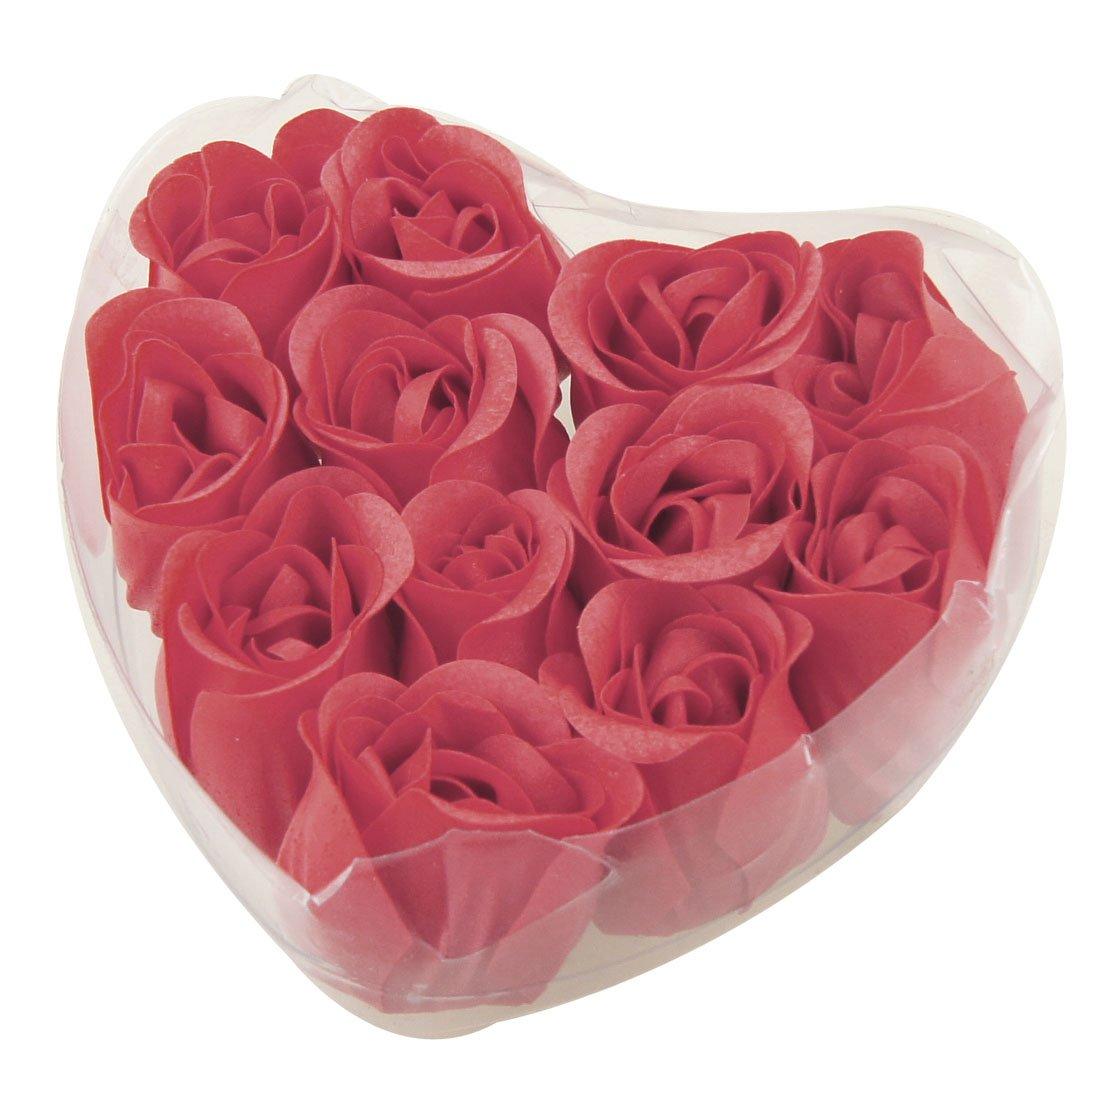 NºMejor venta 12 unids rojo fragante Rose Bud pétalo jabón favor de ...